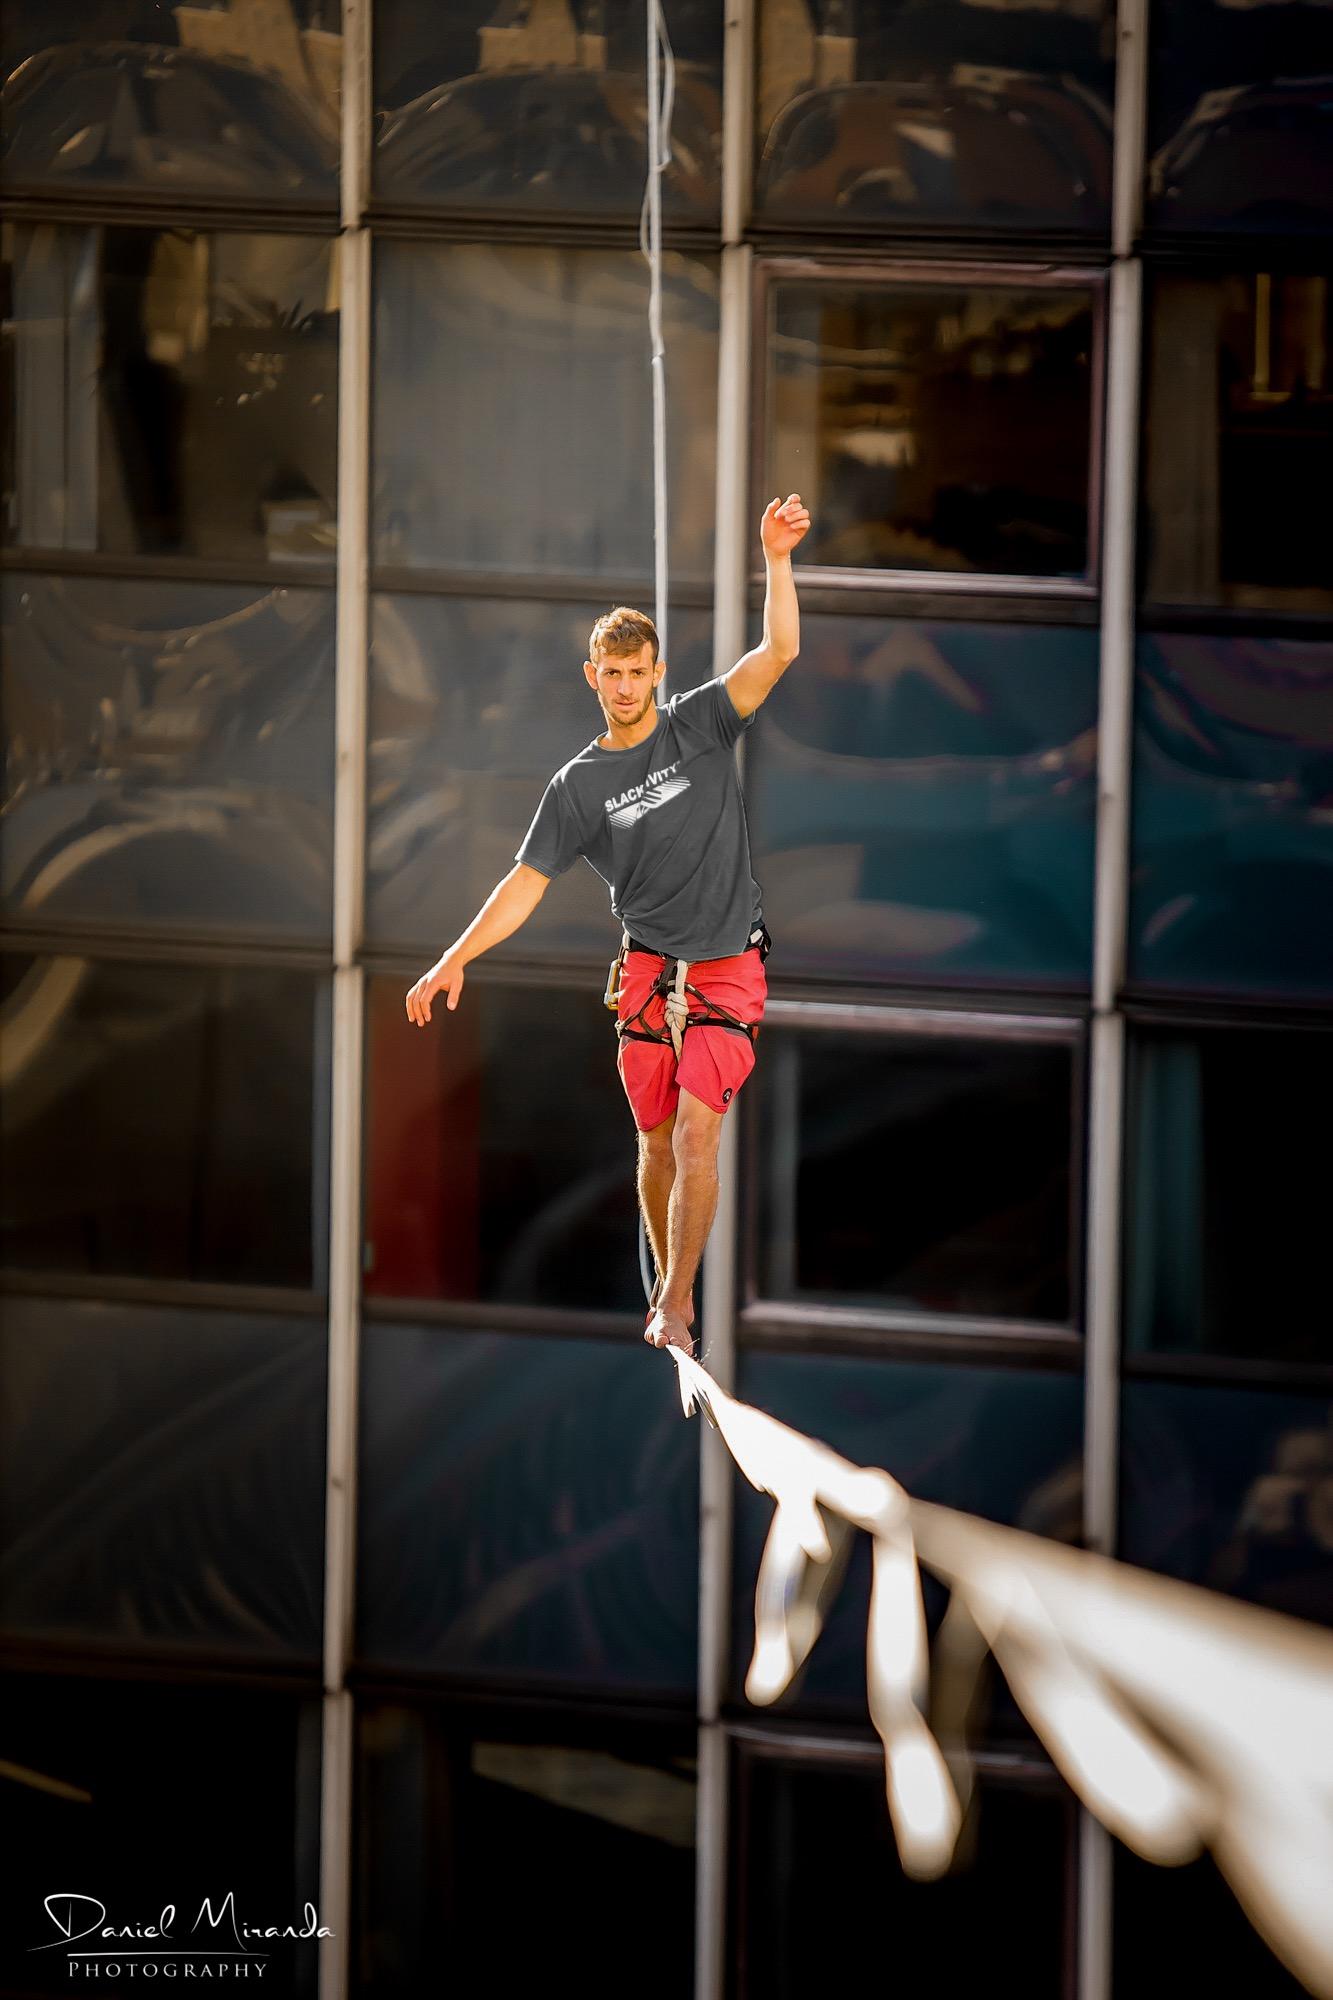 bruxelles brussels zot day belgium Slackline Lyell Grunberg show performance spectacle Highline trickline.JPG